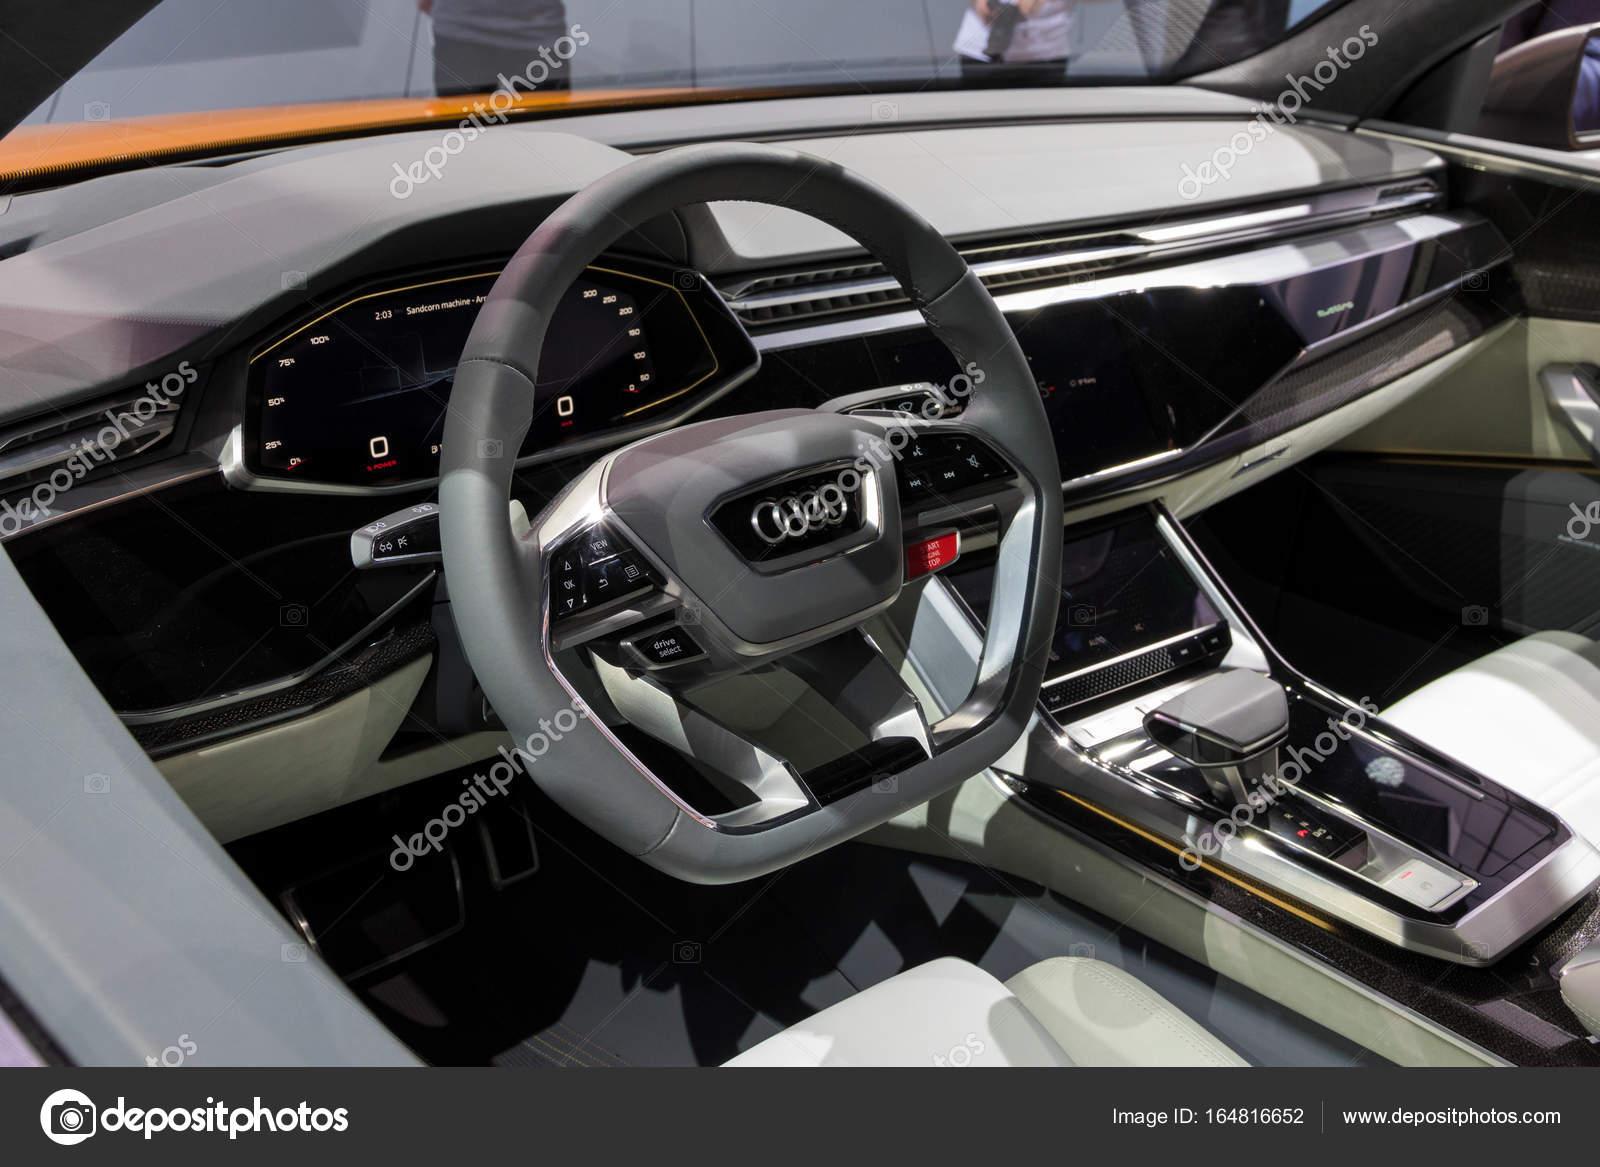 Audi Q8 Interieur : interieur nieuwe audi q8 auto redactionele stockfoto foto vdw 164816652 ~ Medecine-chirurgie-esthetiques.com Avis de Voitures